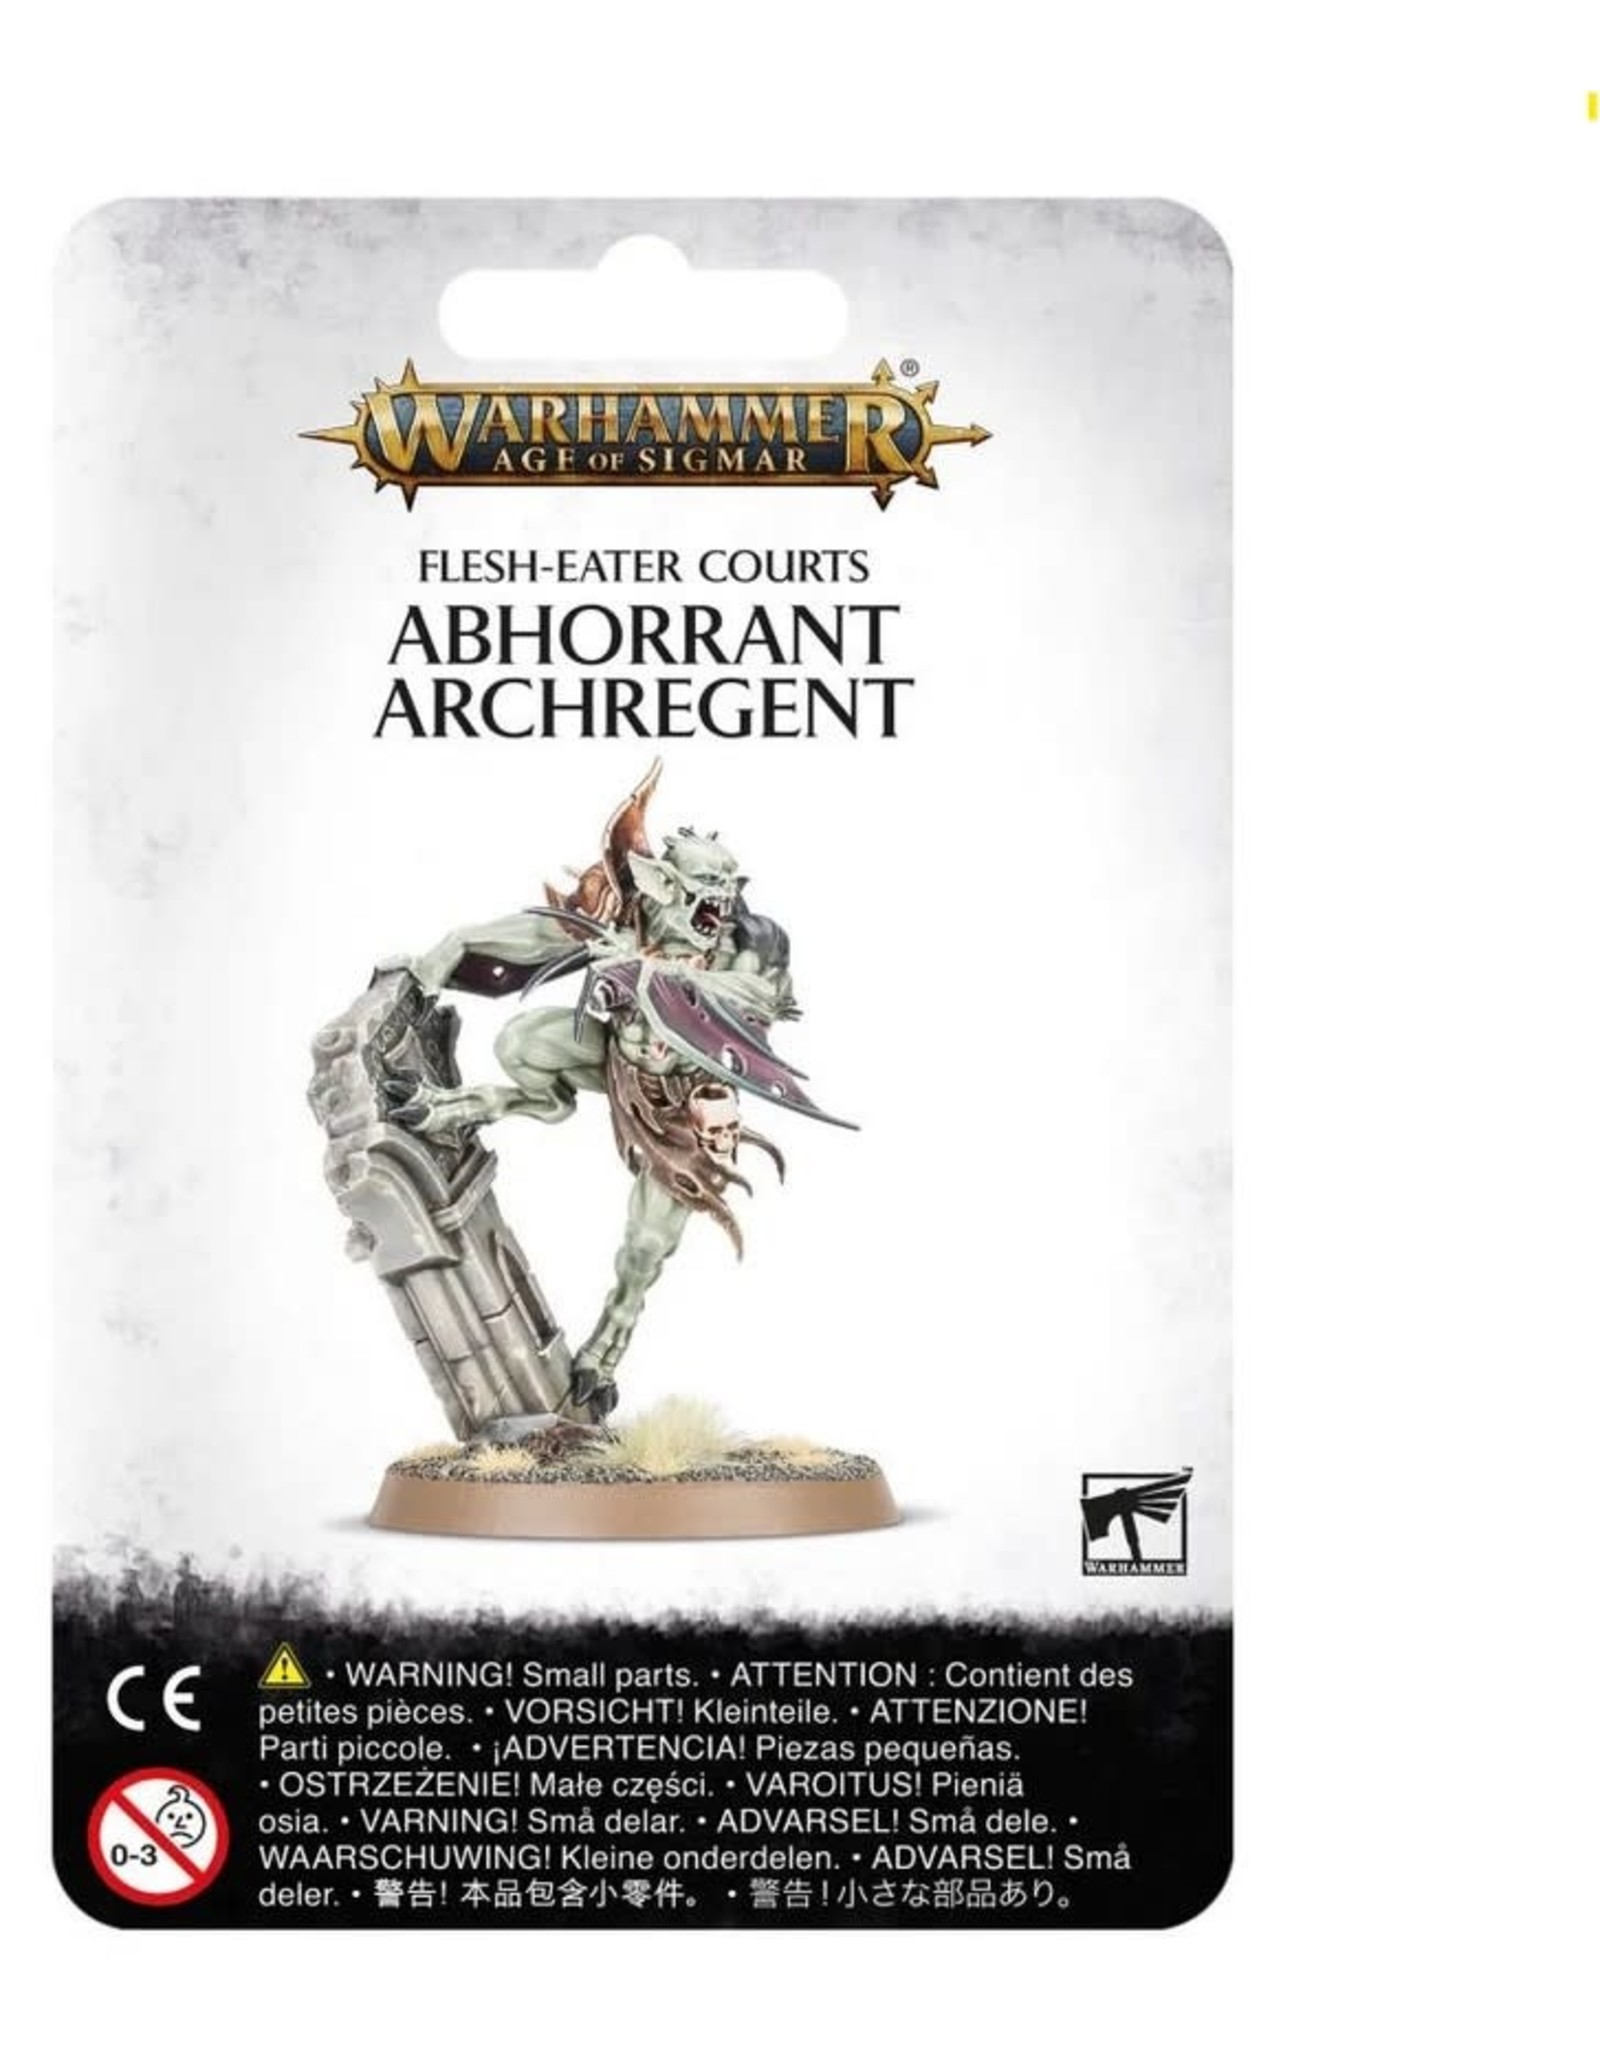 Warhammer AoS WHAoS Flesh-Eater Courts - Abhorrant Archregent